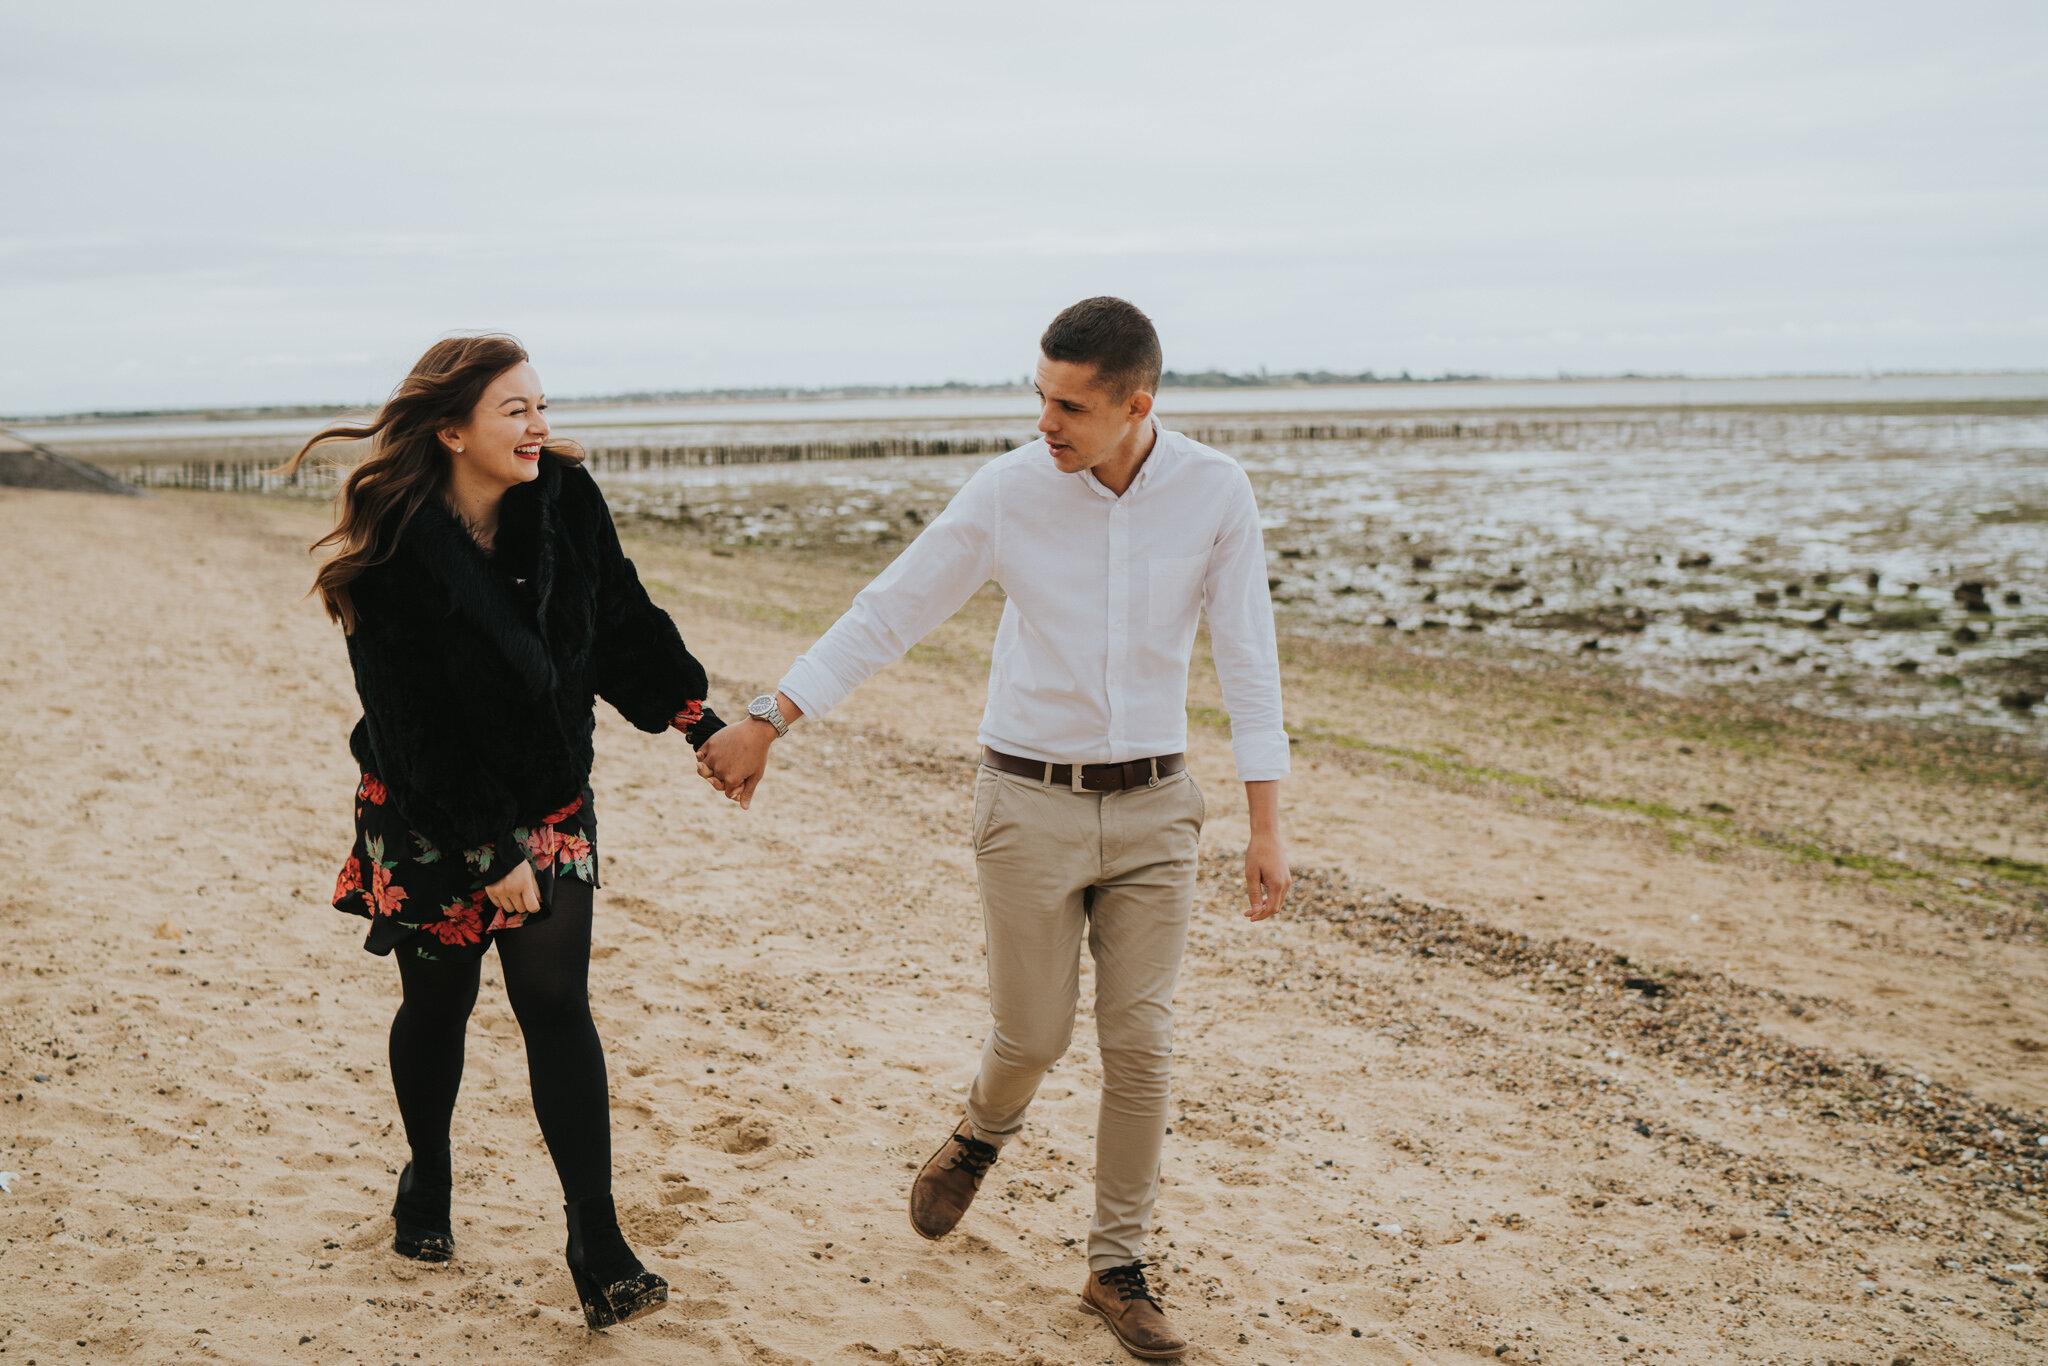 engagement-pre-wedding-hannah-michael-cudmore-grove-east-mersea-grace-elizabeth-colchester-essex-devon-suffolk-and-norfolk-alternative-wedding-and-family-photographer (2 of 51).jpg